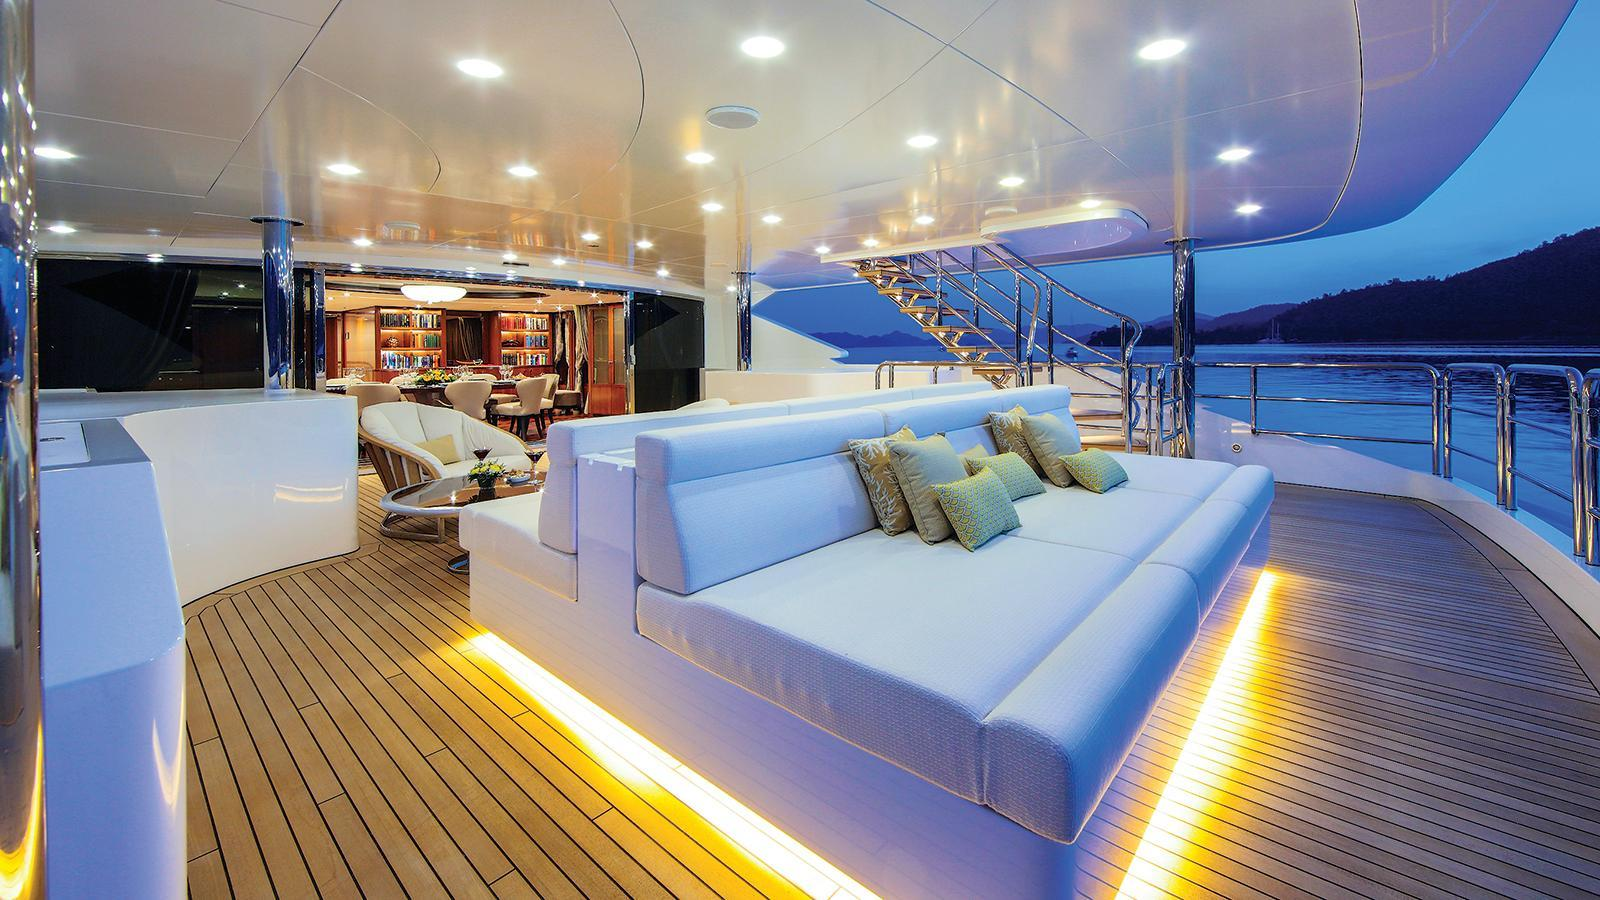 vica-motor-yacht-benetti-2015-50m-aft-deck